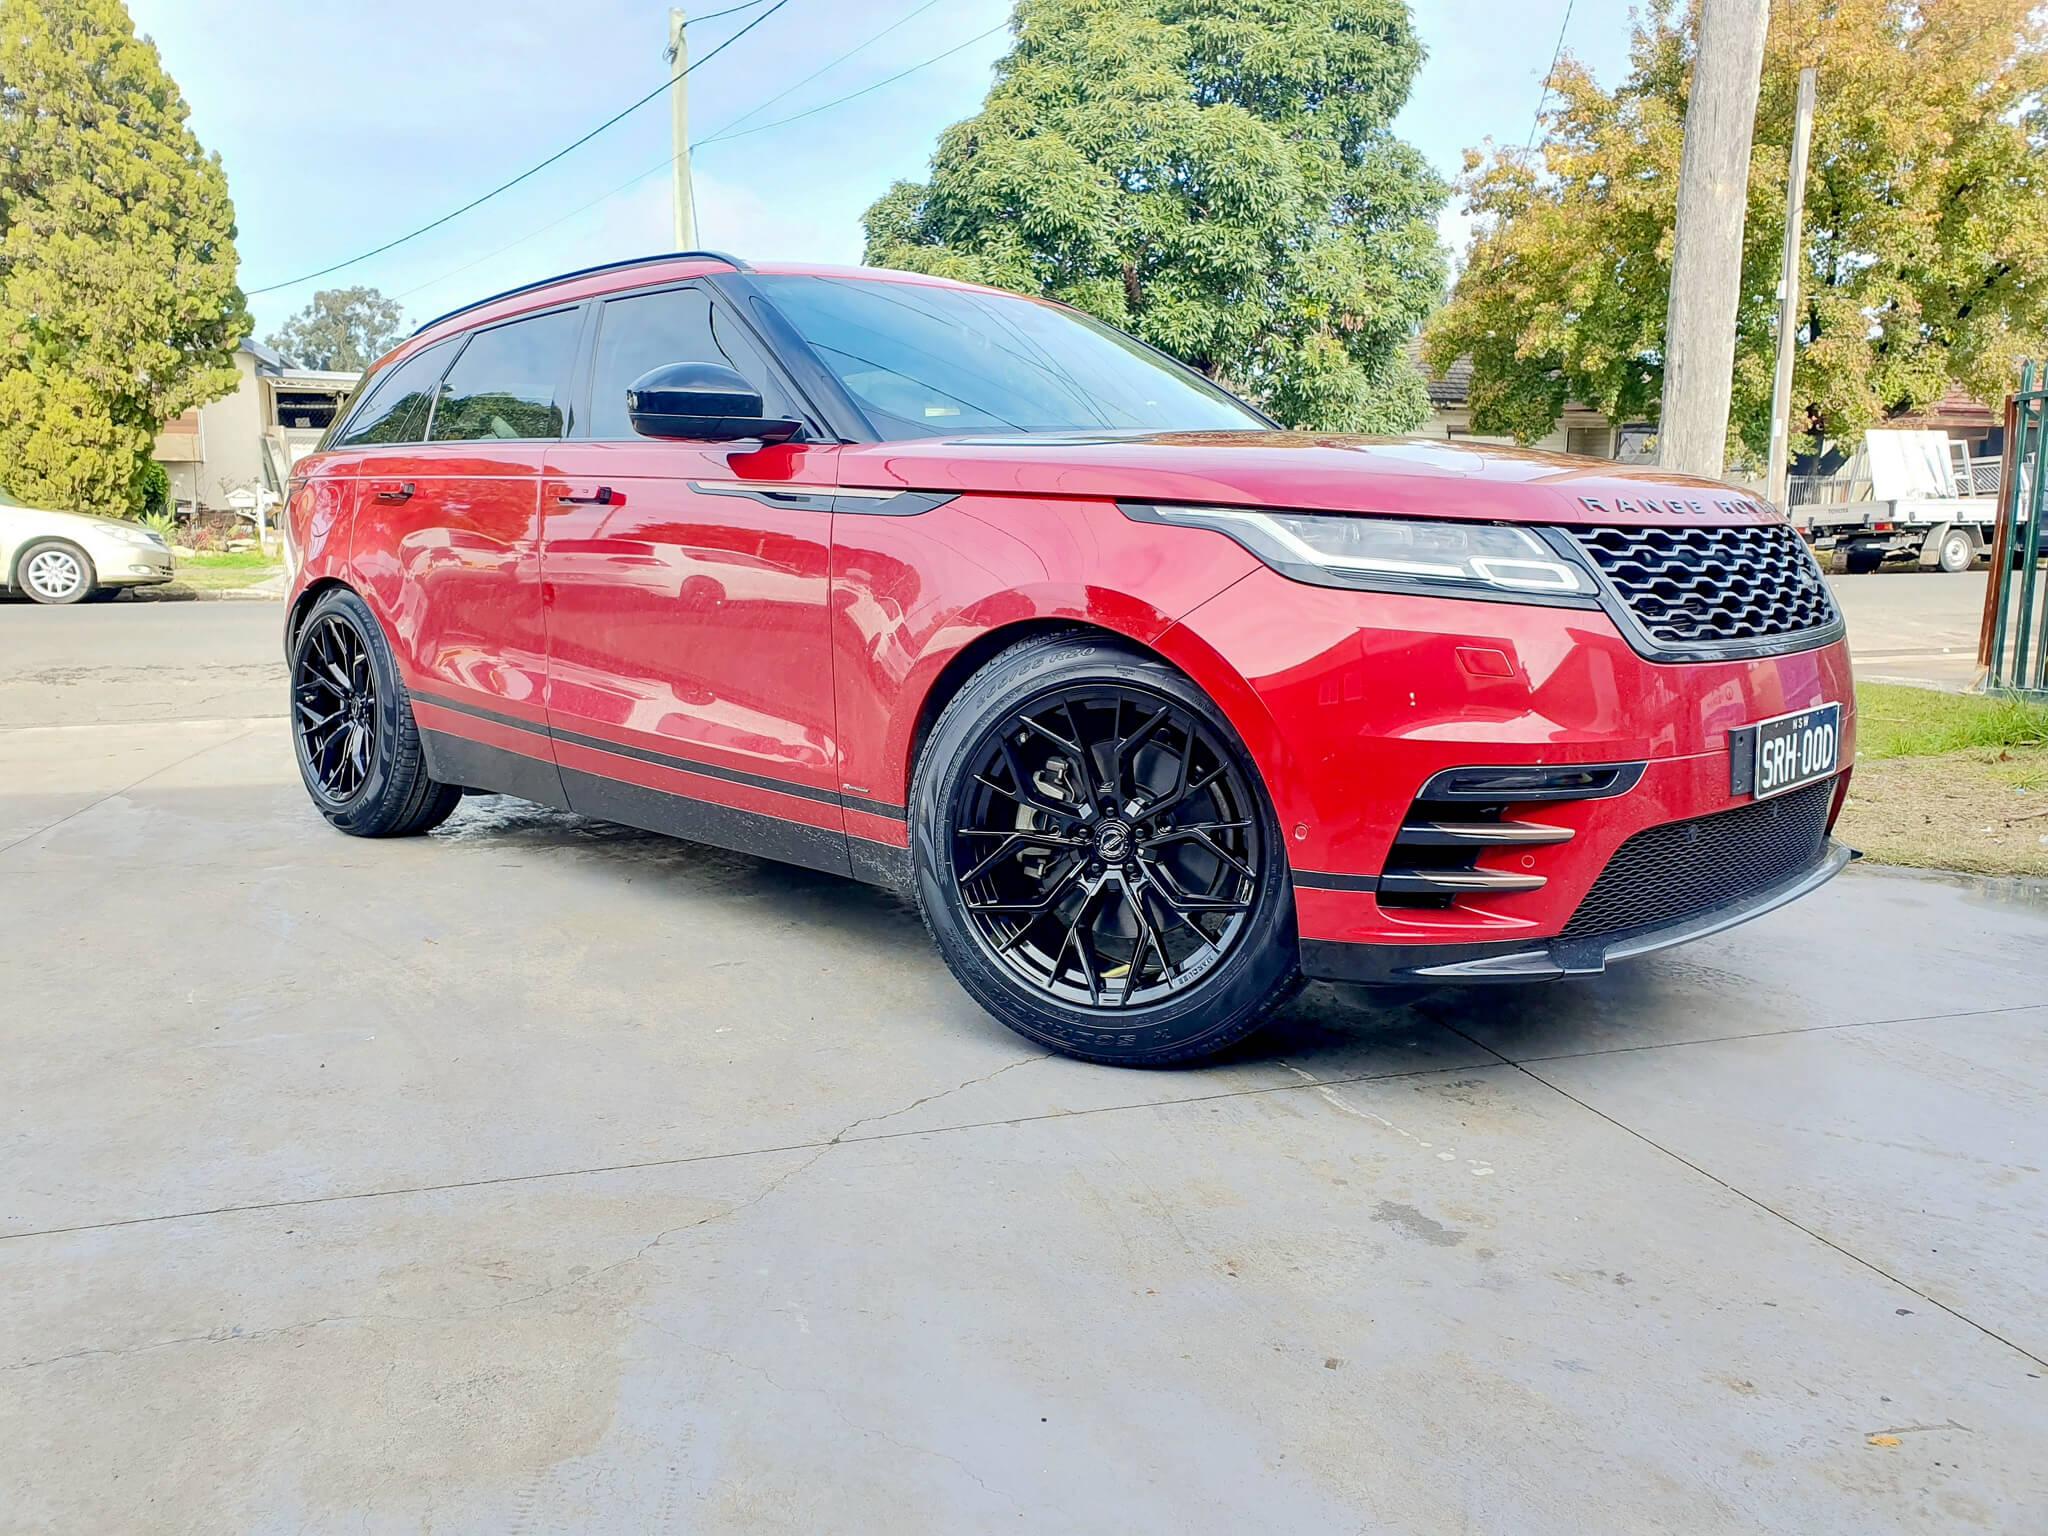 Range Rover Wheels 20 inch GT Form Marquee Satin Black